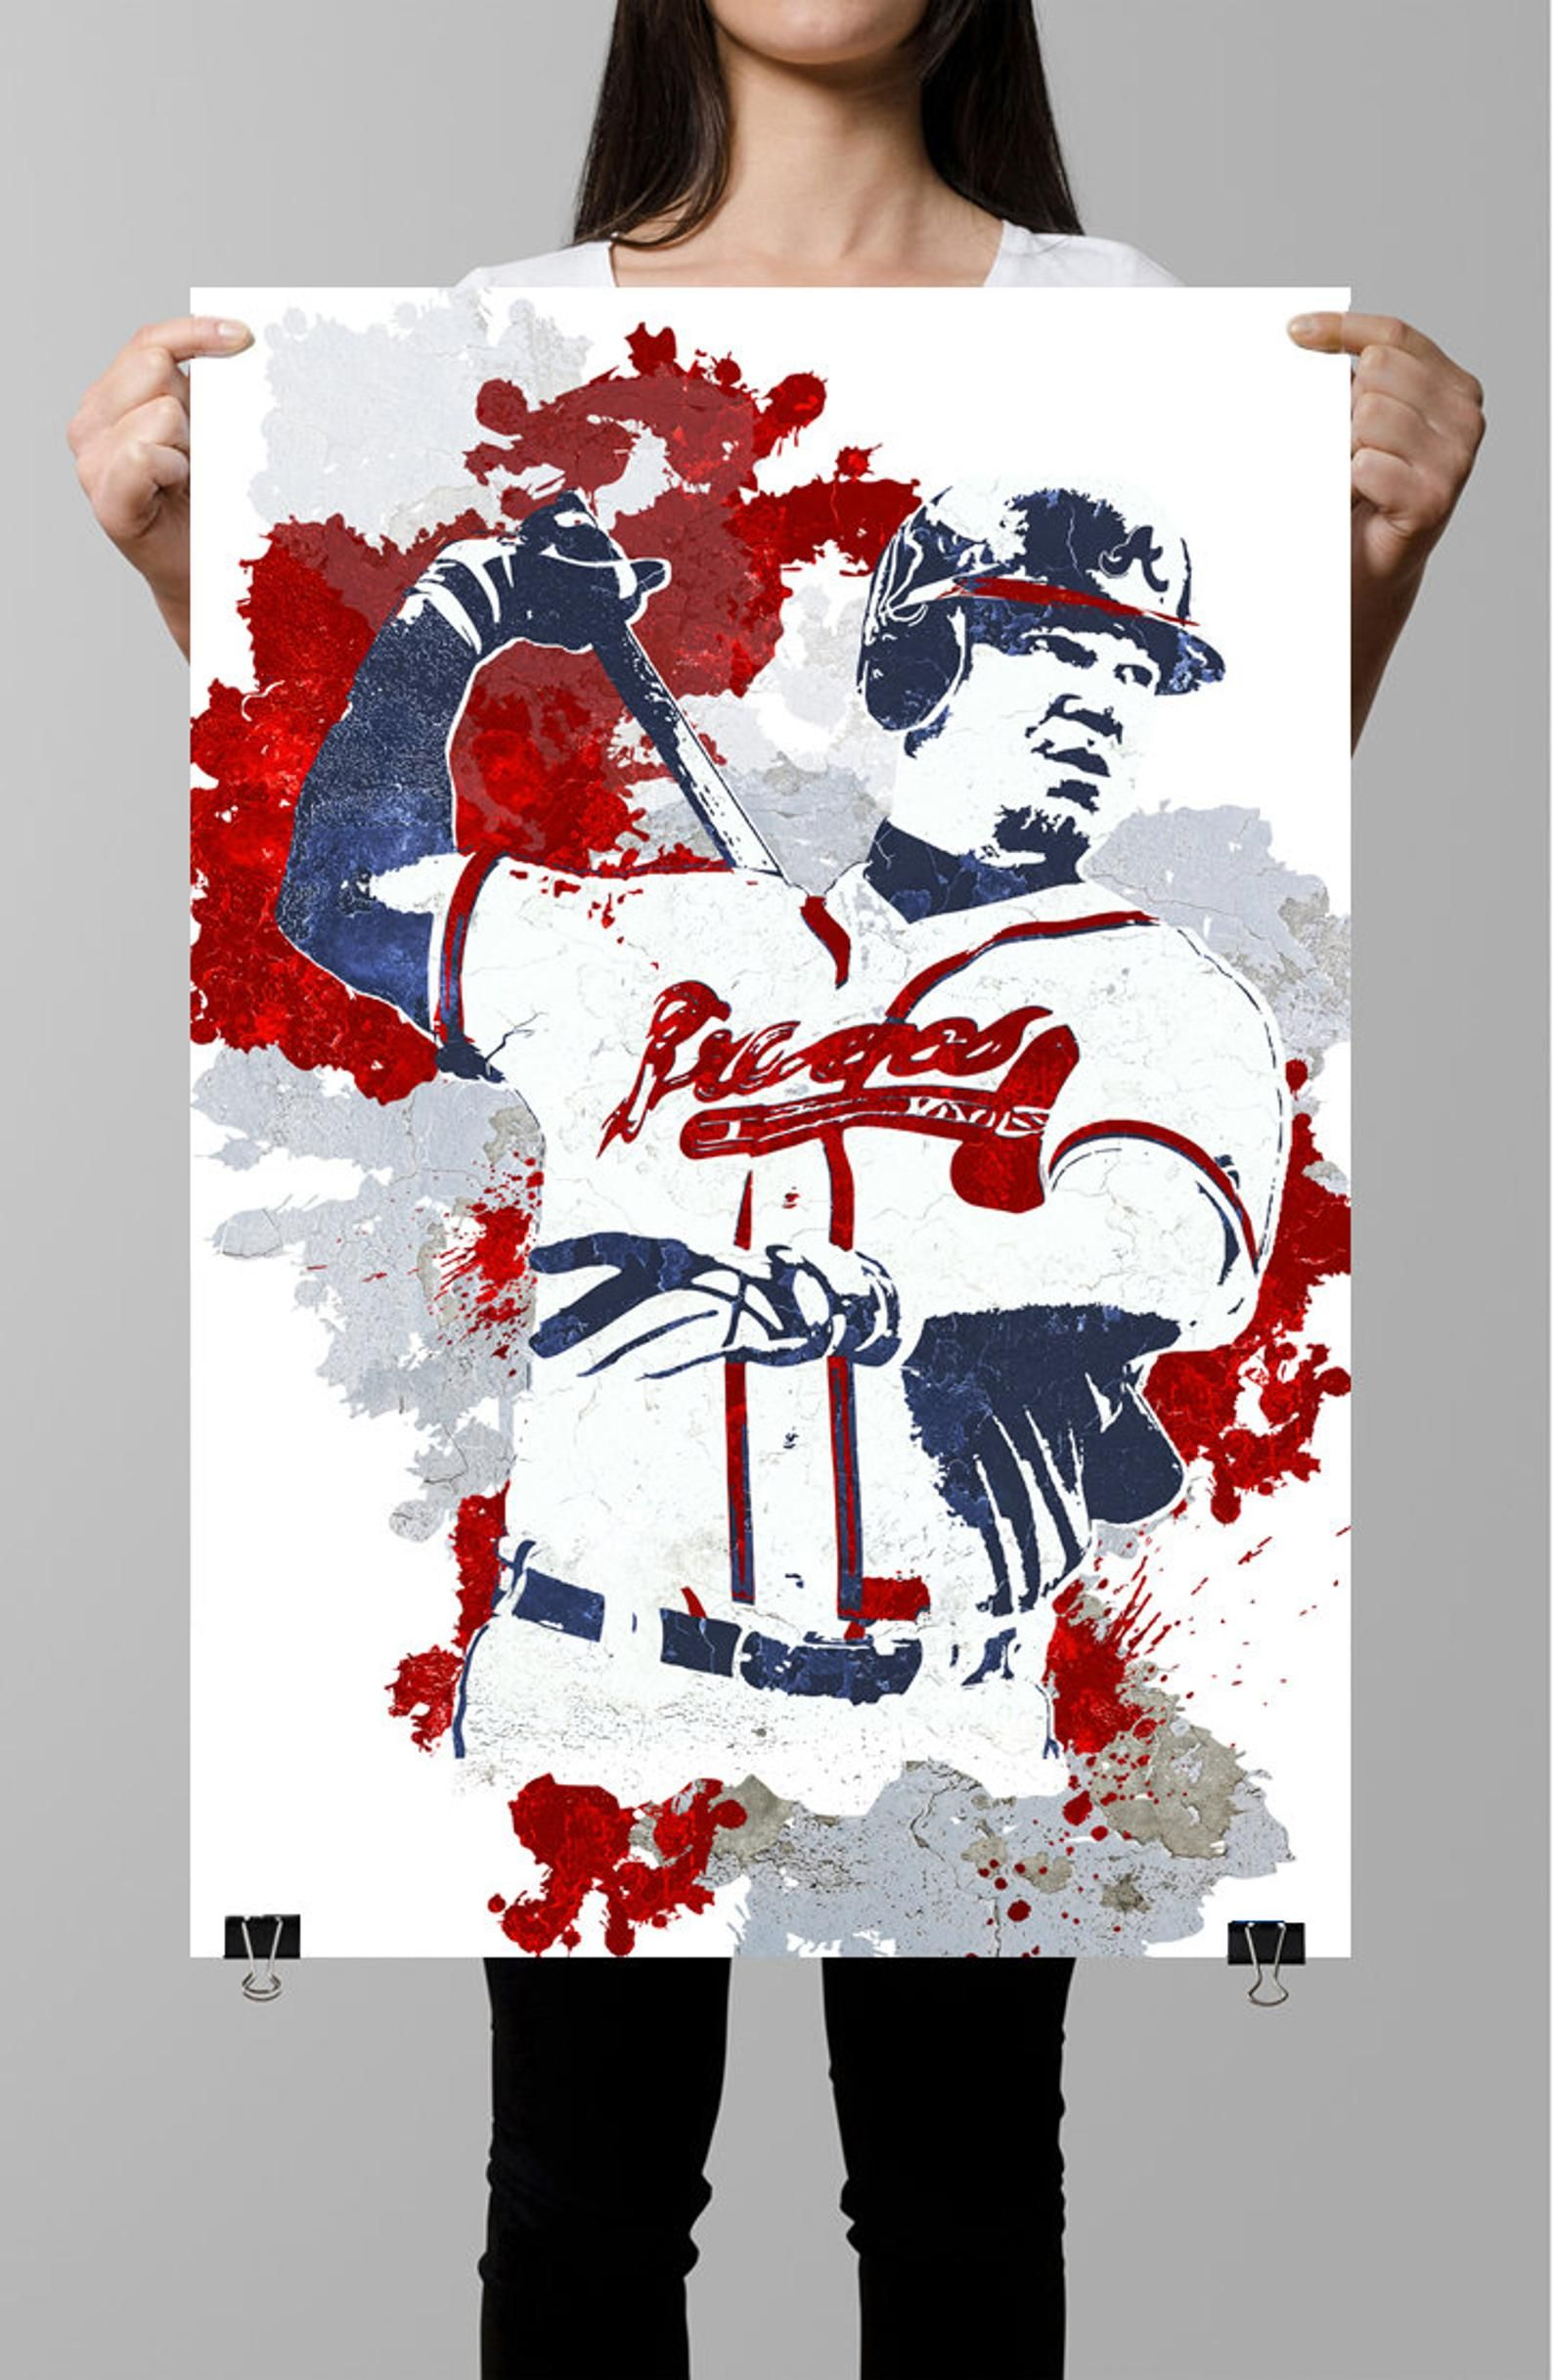 Chipper Jones Atlanta Braves Sports Poster Fan Art Wall Art Etsy Atlanta Braves Chipper Jones Braves